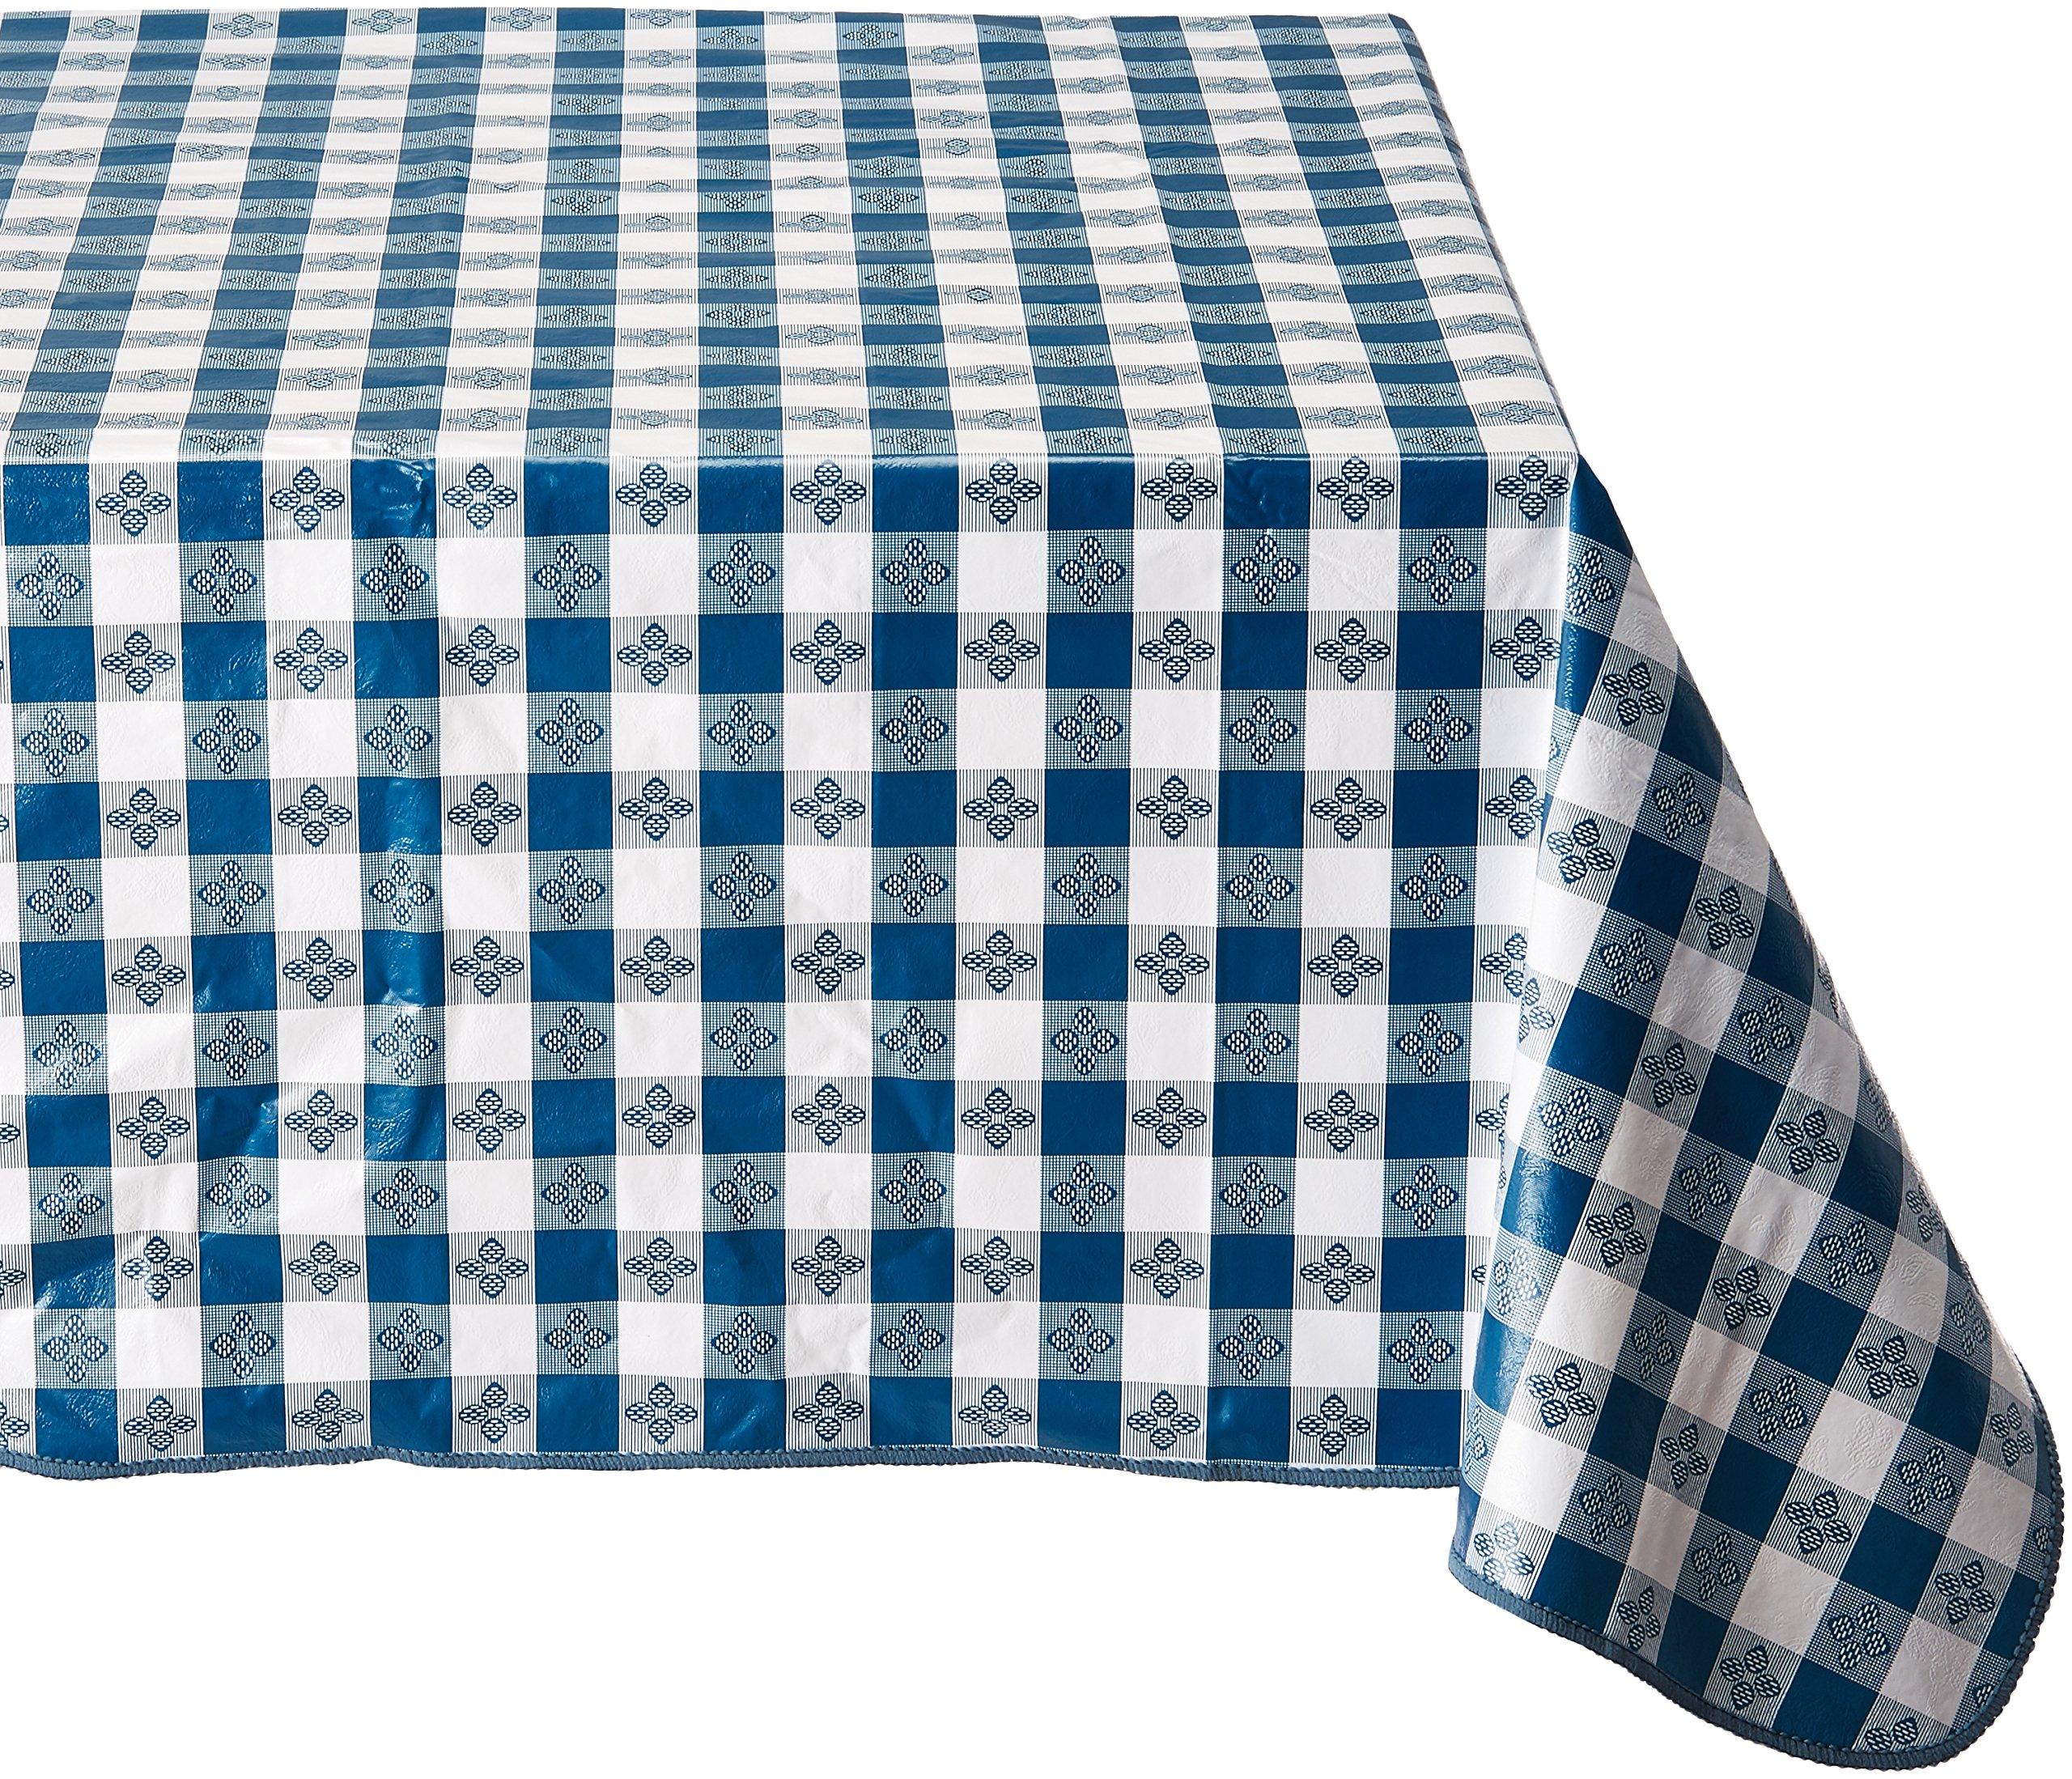 Winco 52-Inch x 90-Inch Checkered Table Cloth, Blue